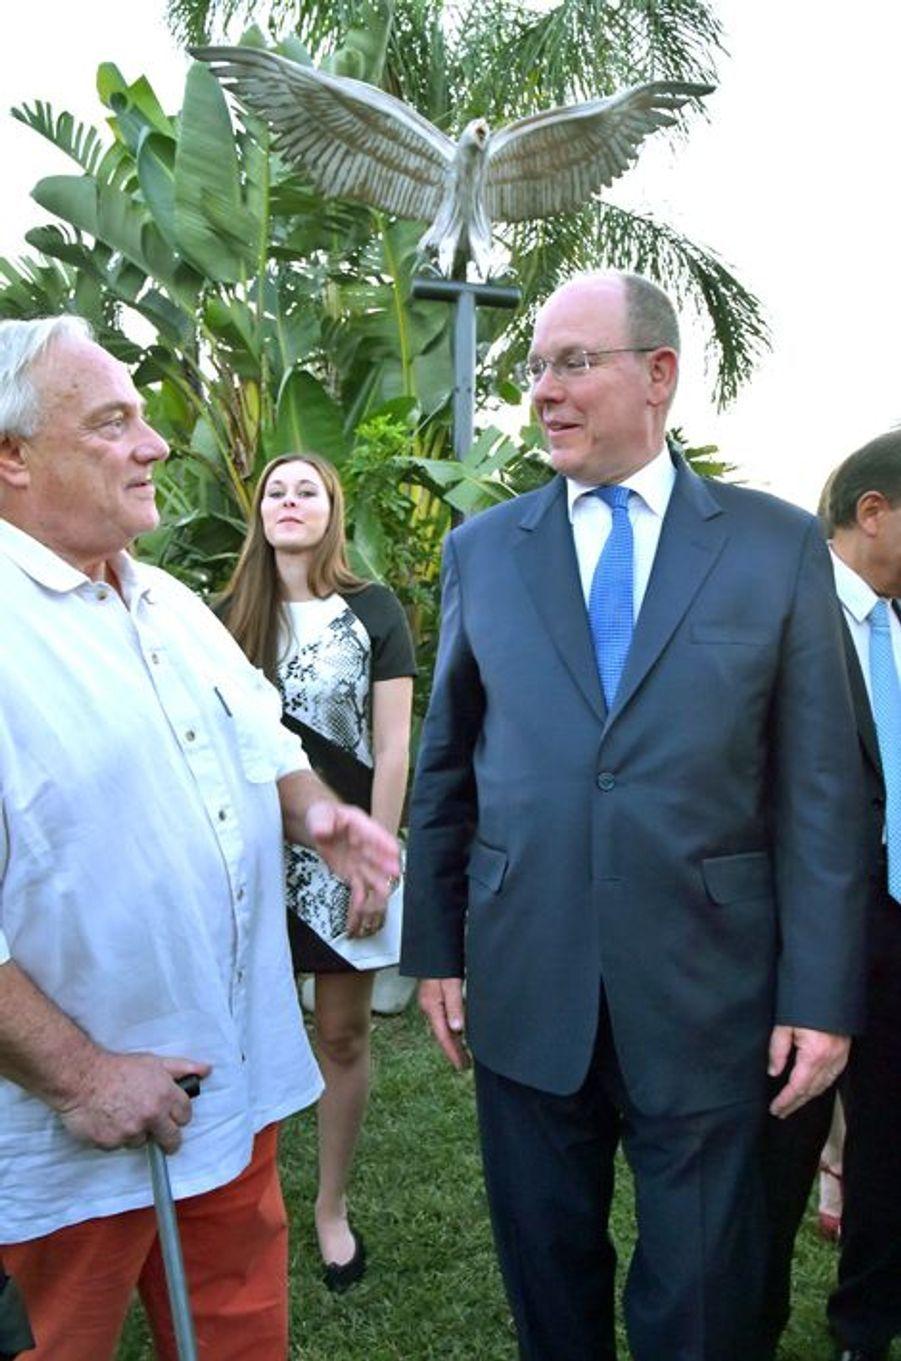 Le prince Albert II de Monaco avec l'artiste Mateo Mornad à Roquebrune Cap-Martin, le 7 septembre 2015